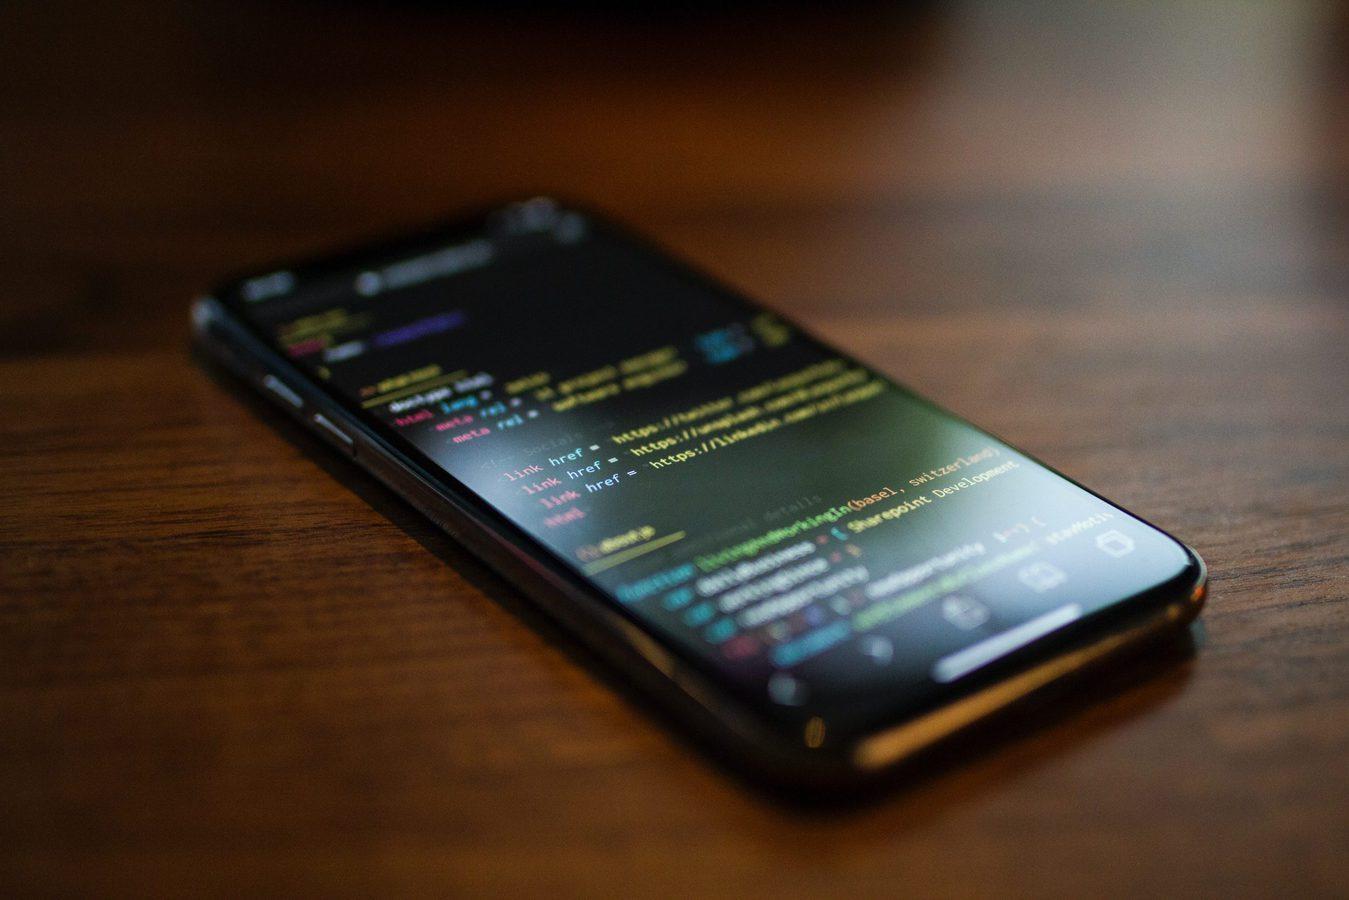 href код на мобильном телефоне